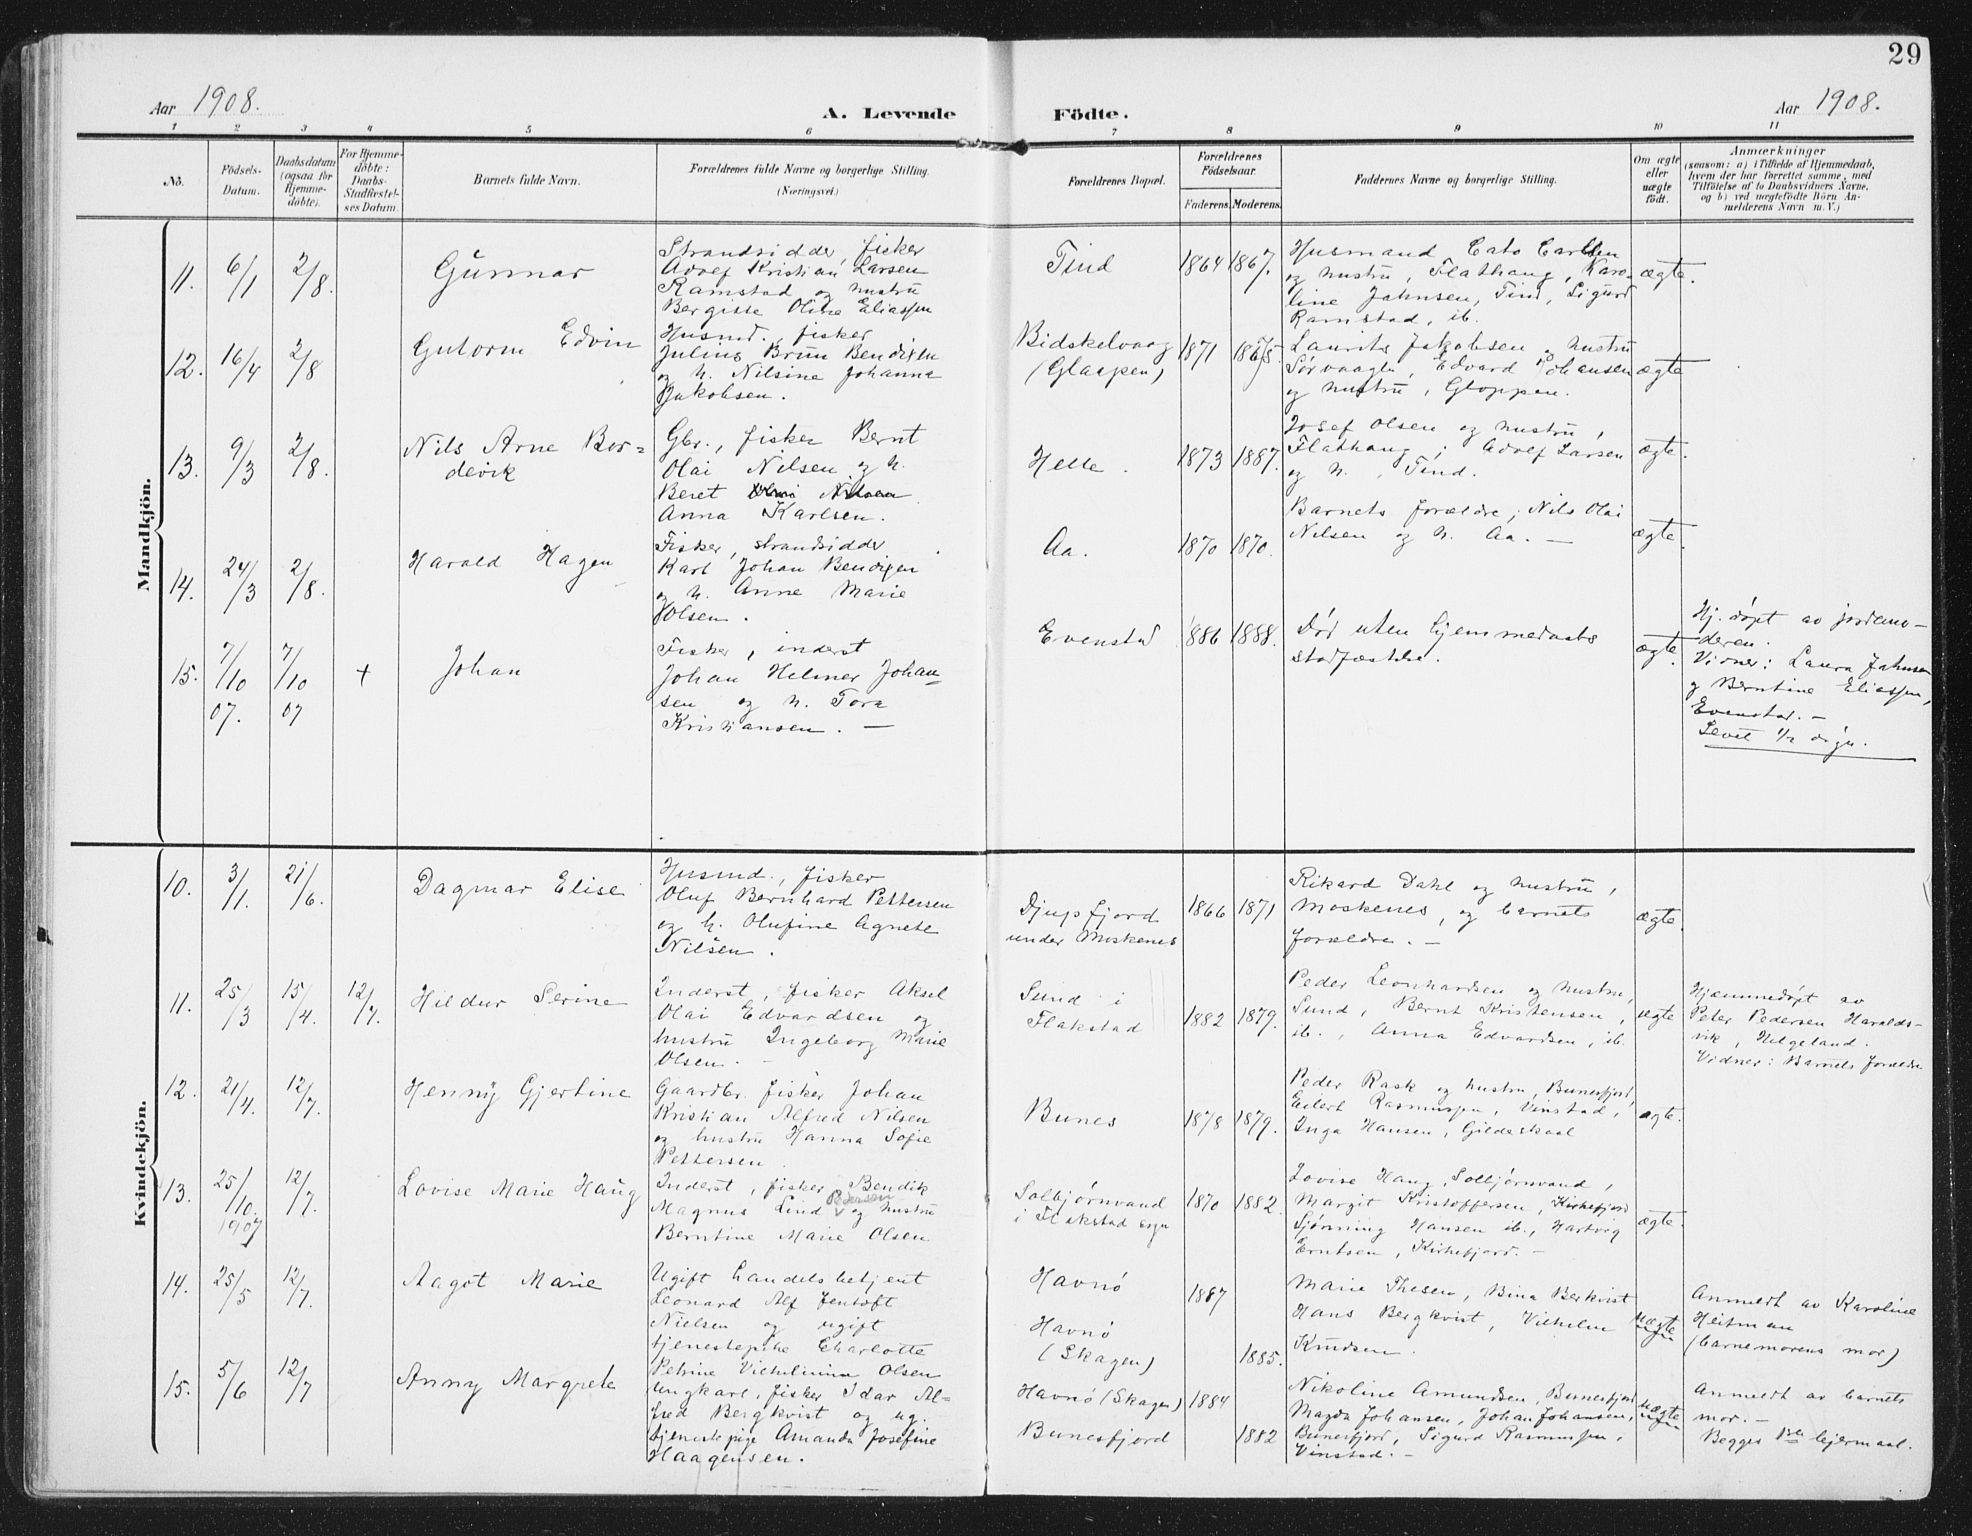 SAT, Ministerialprotokoller, klokkerbøker og fødselsregistre - Nordland, 886/L1221: Ministerialbok nr. 886A03, 1903-1913, s. 29